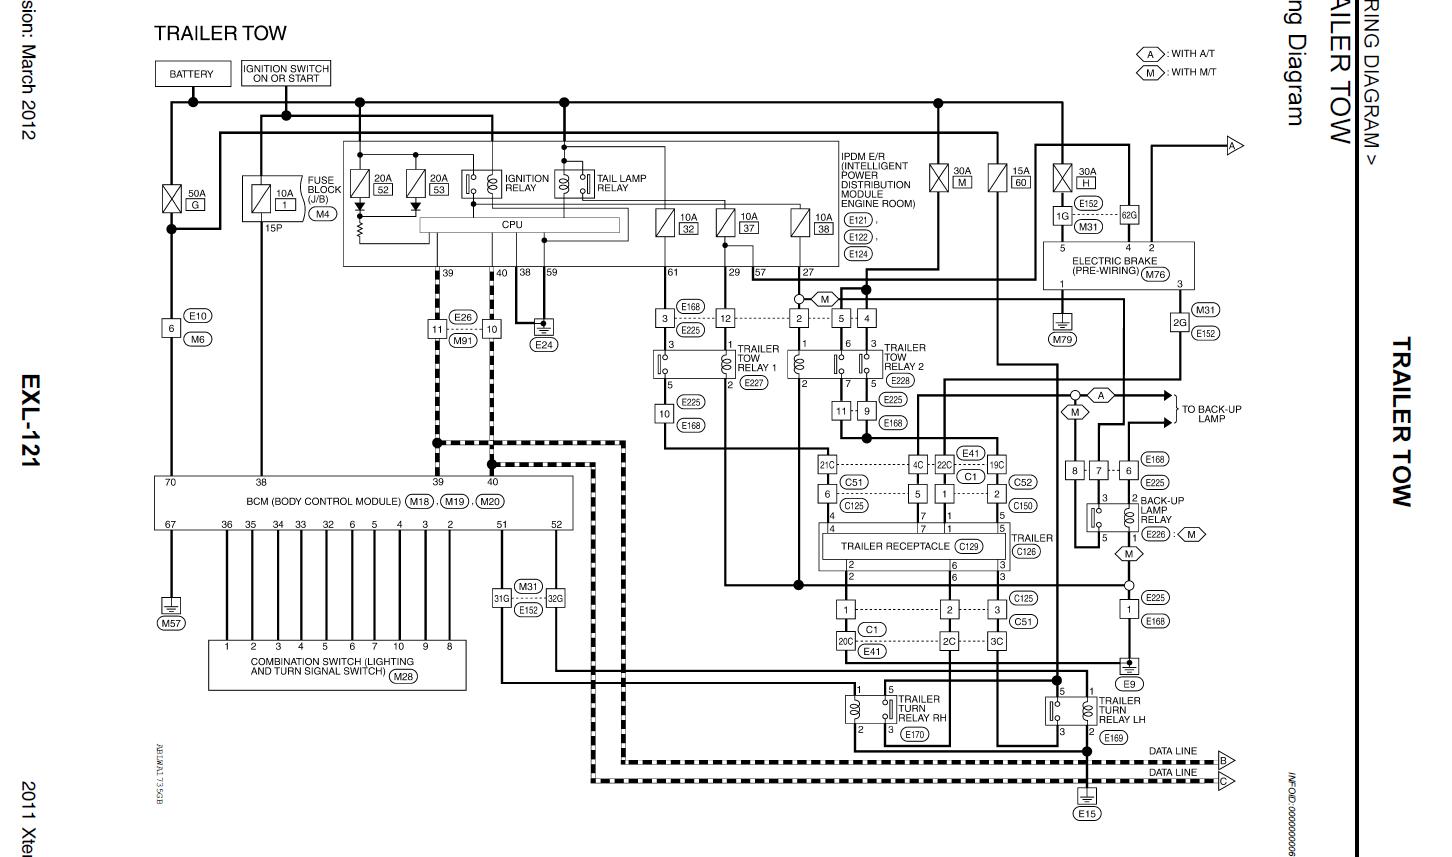 Trailer Wiring Diagram For Nissan Frontier | Trailer wiring diagram, Nissan  frontier, Nissan | 2007 Xterra Wiring Diagram Lights |  | Pinterest